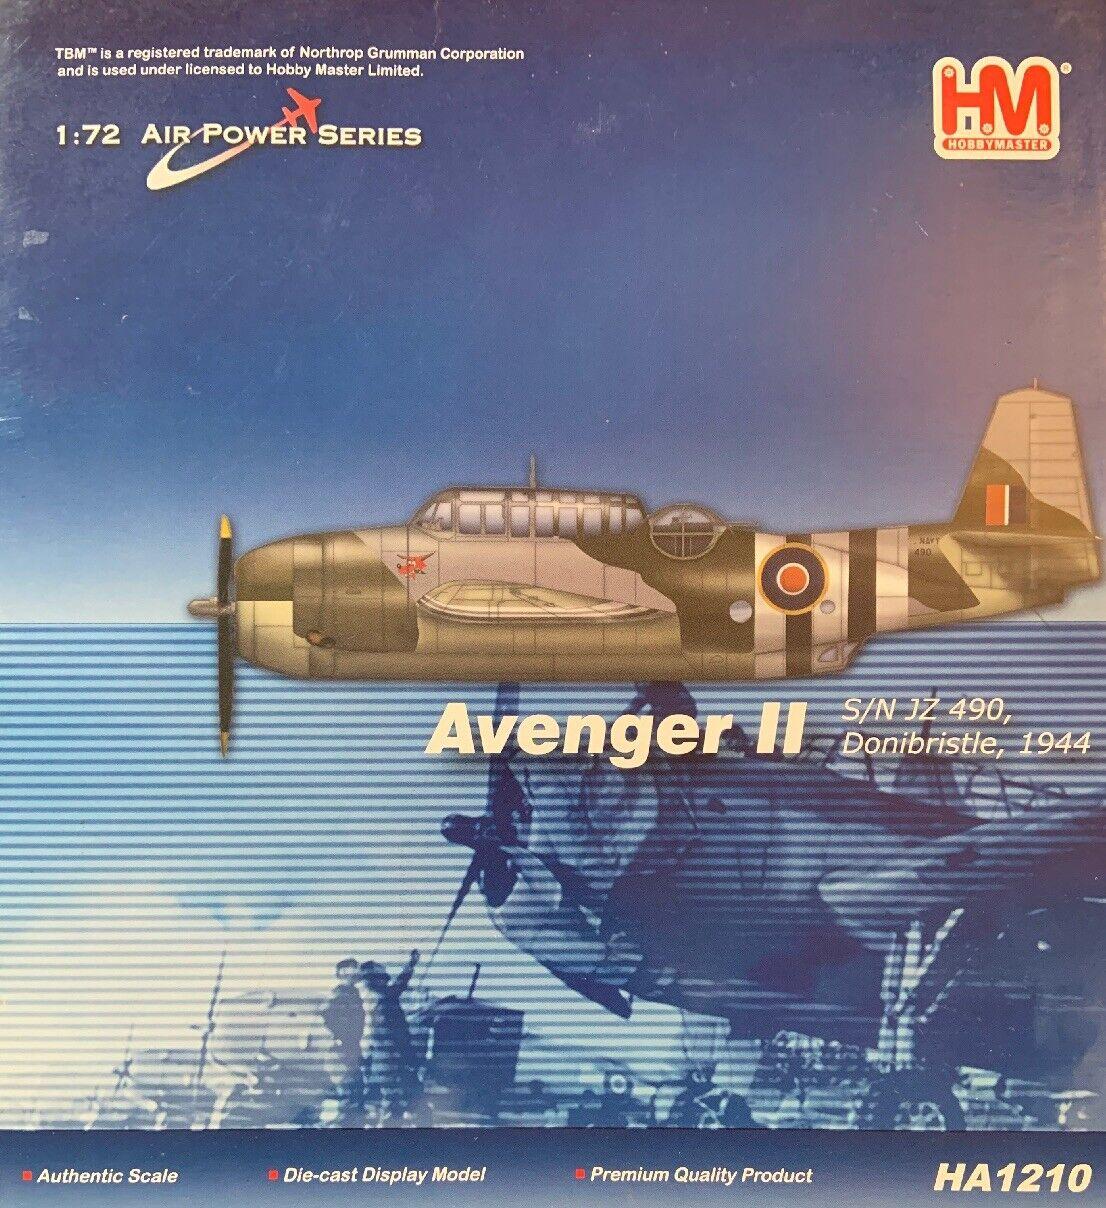 Hobby Master 1 72 Air Power Series HA1210 Grumman Avenger II, JZ-490, 1944